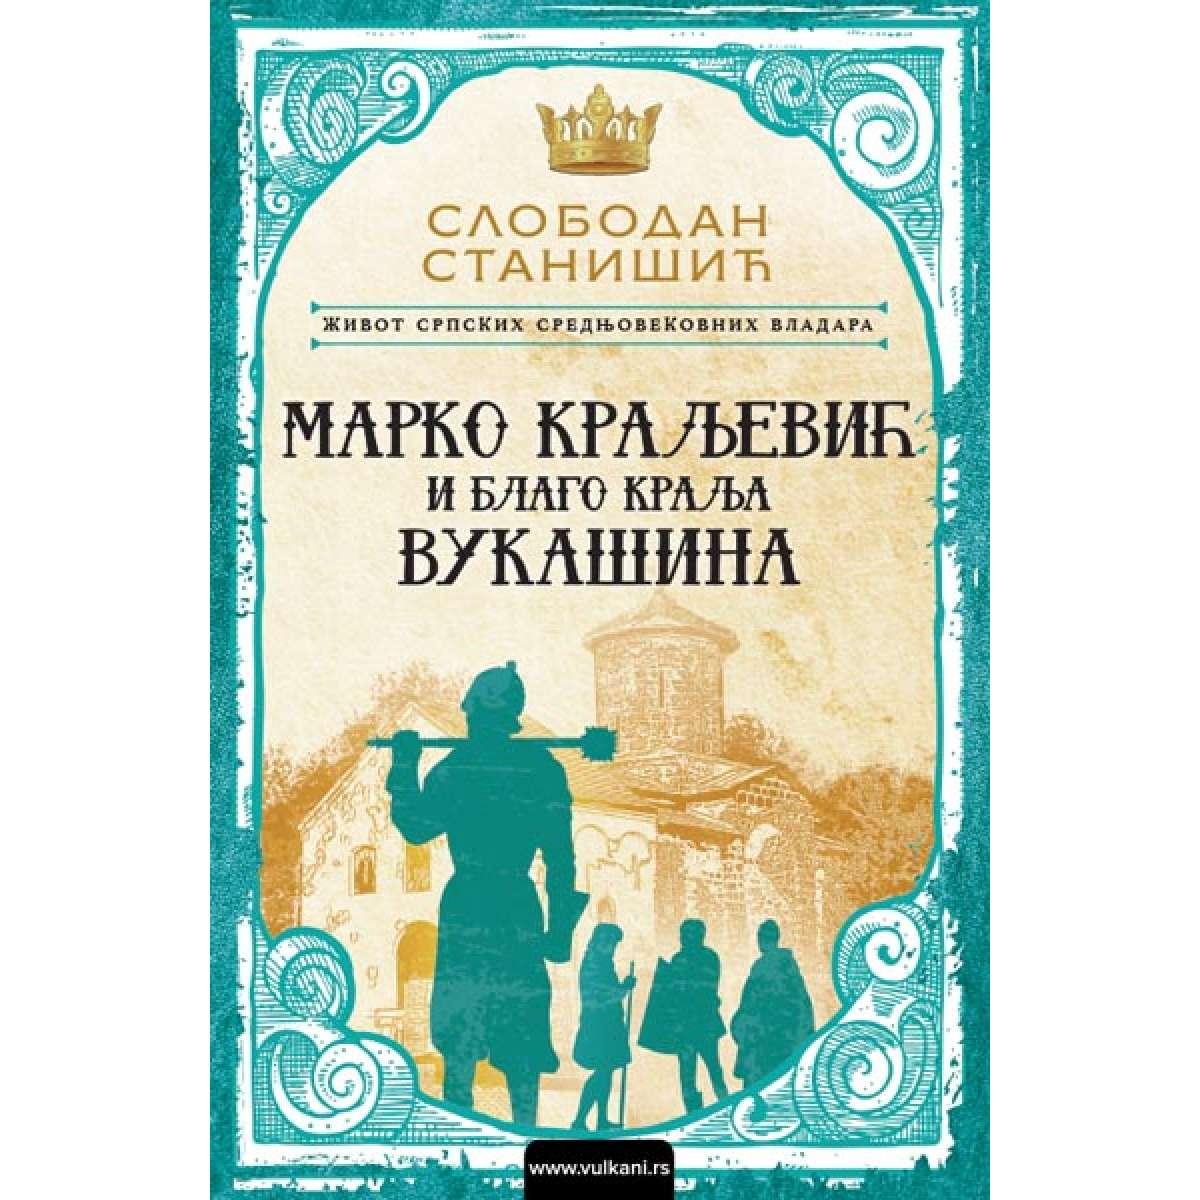 ŽIVOT SRPSKIH SREDNJOVEKOVNIH VLADARA: MARKO KRALJEVIĆ I BLAGO KRALJA VUKAŠINA